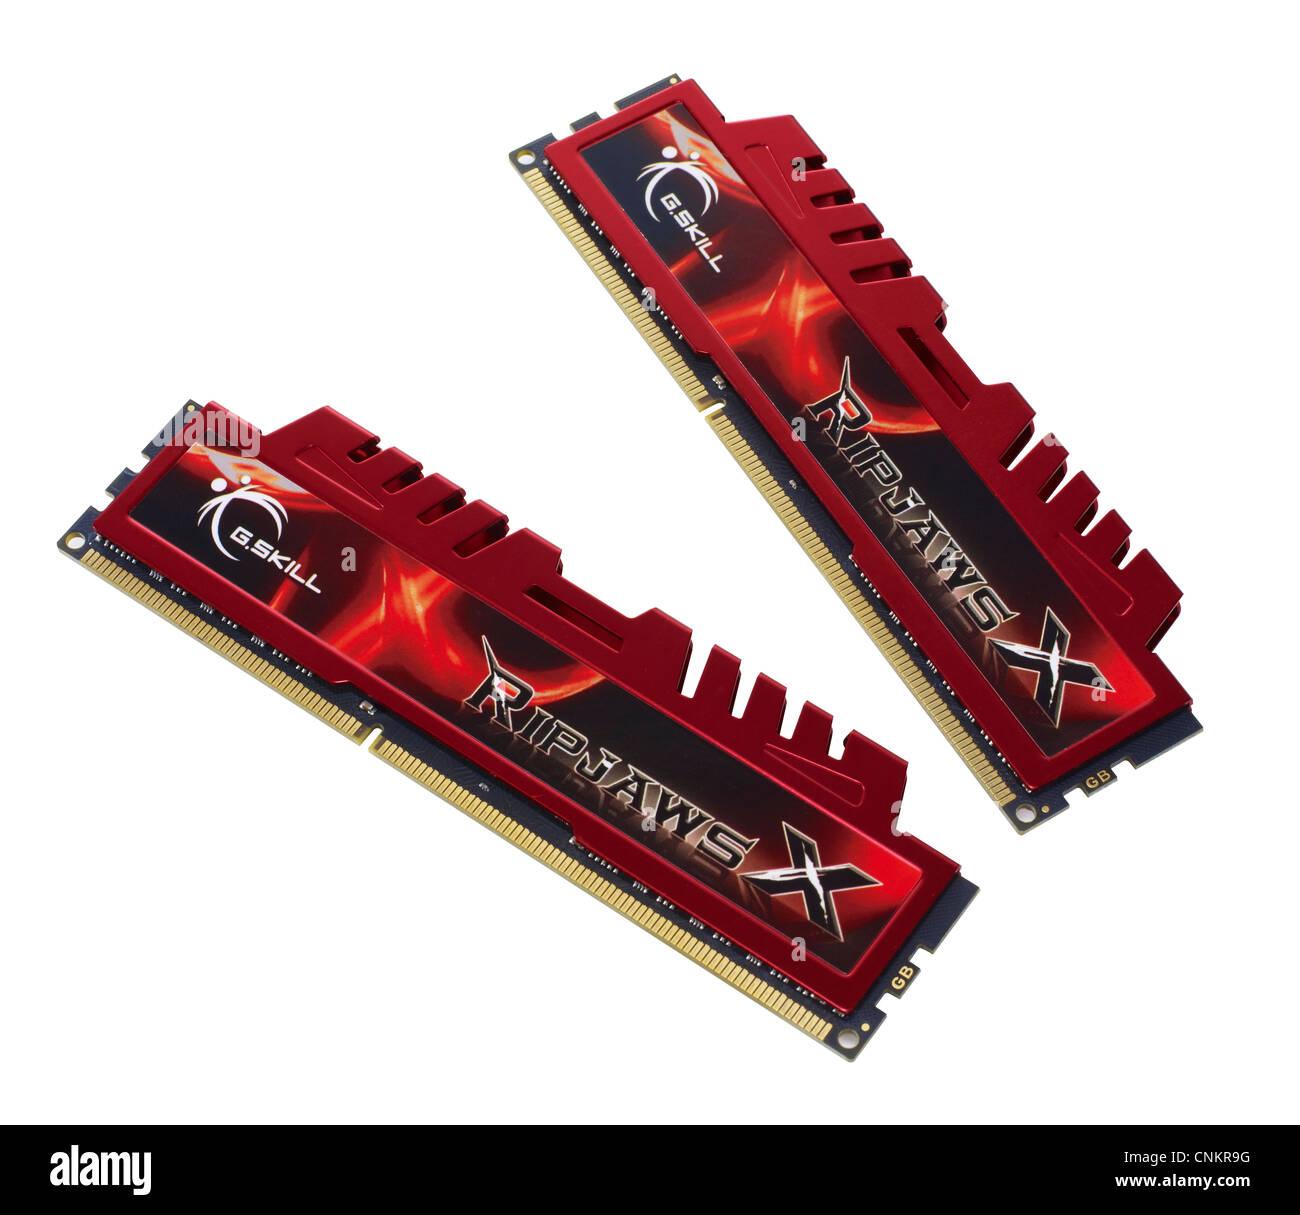 Computer Random Access Memory modules - Stock Image